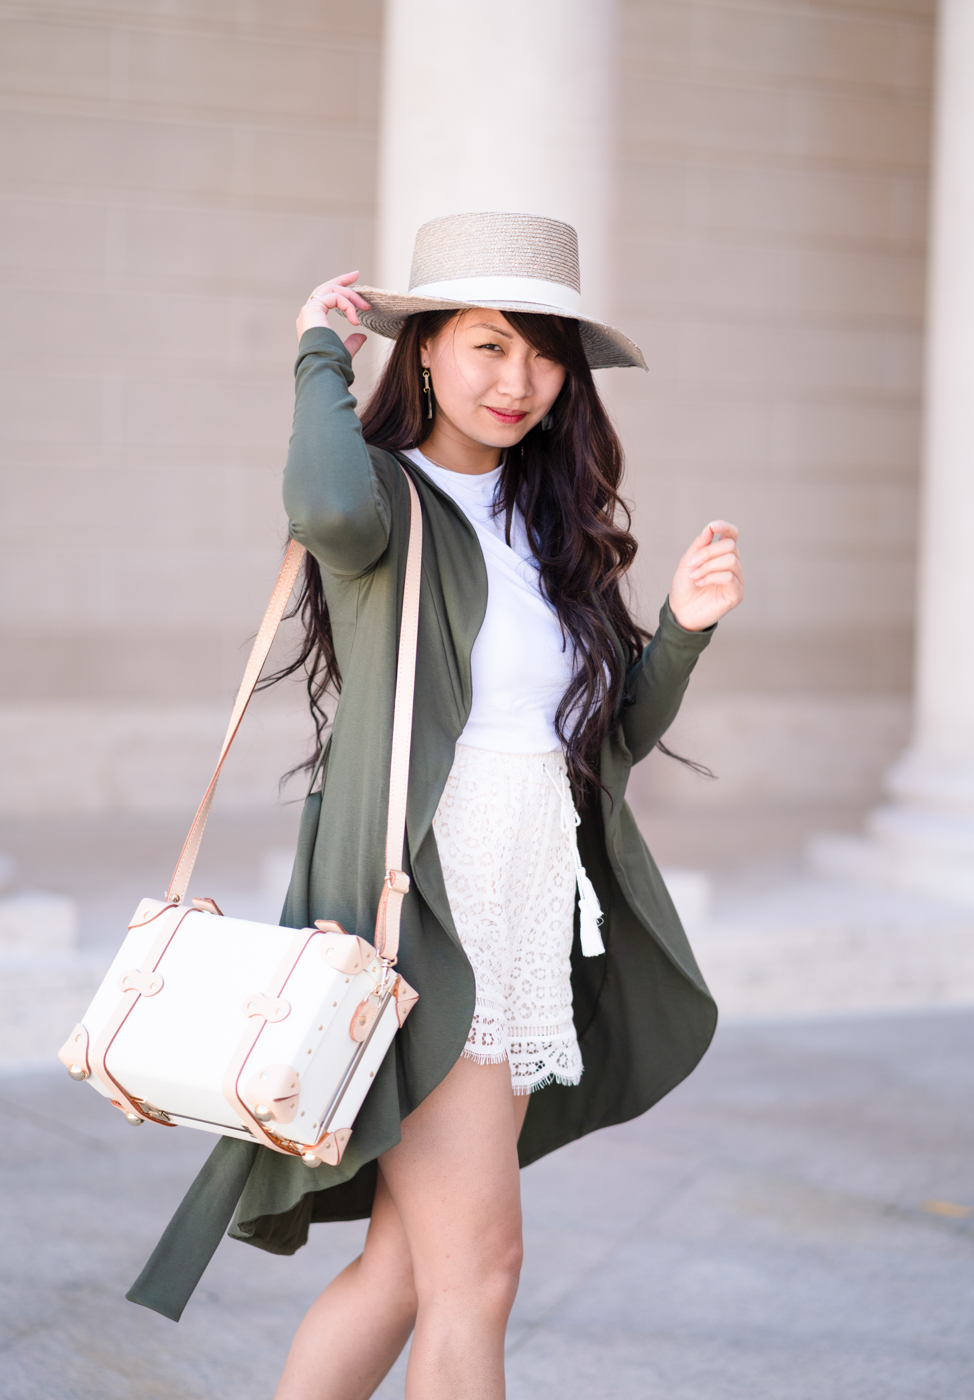 Ethical Fashion | Janessa Leone bolero hat & La Fille Colette Portmanteau Jacket | The Chic Diary